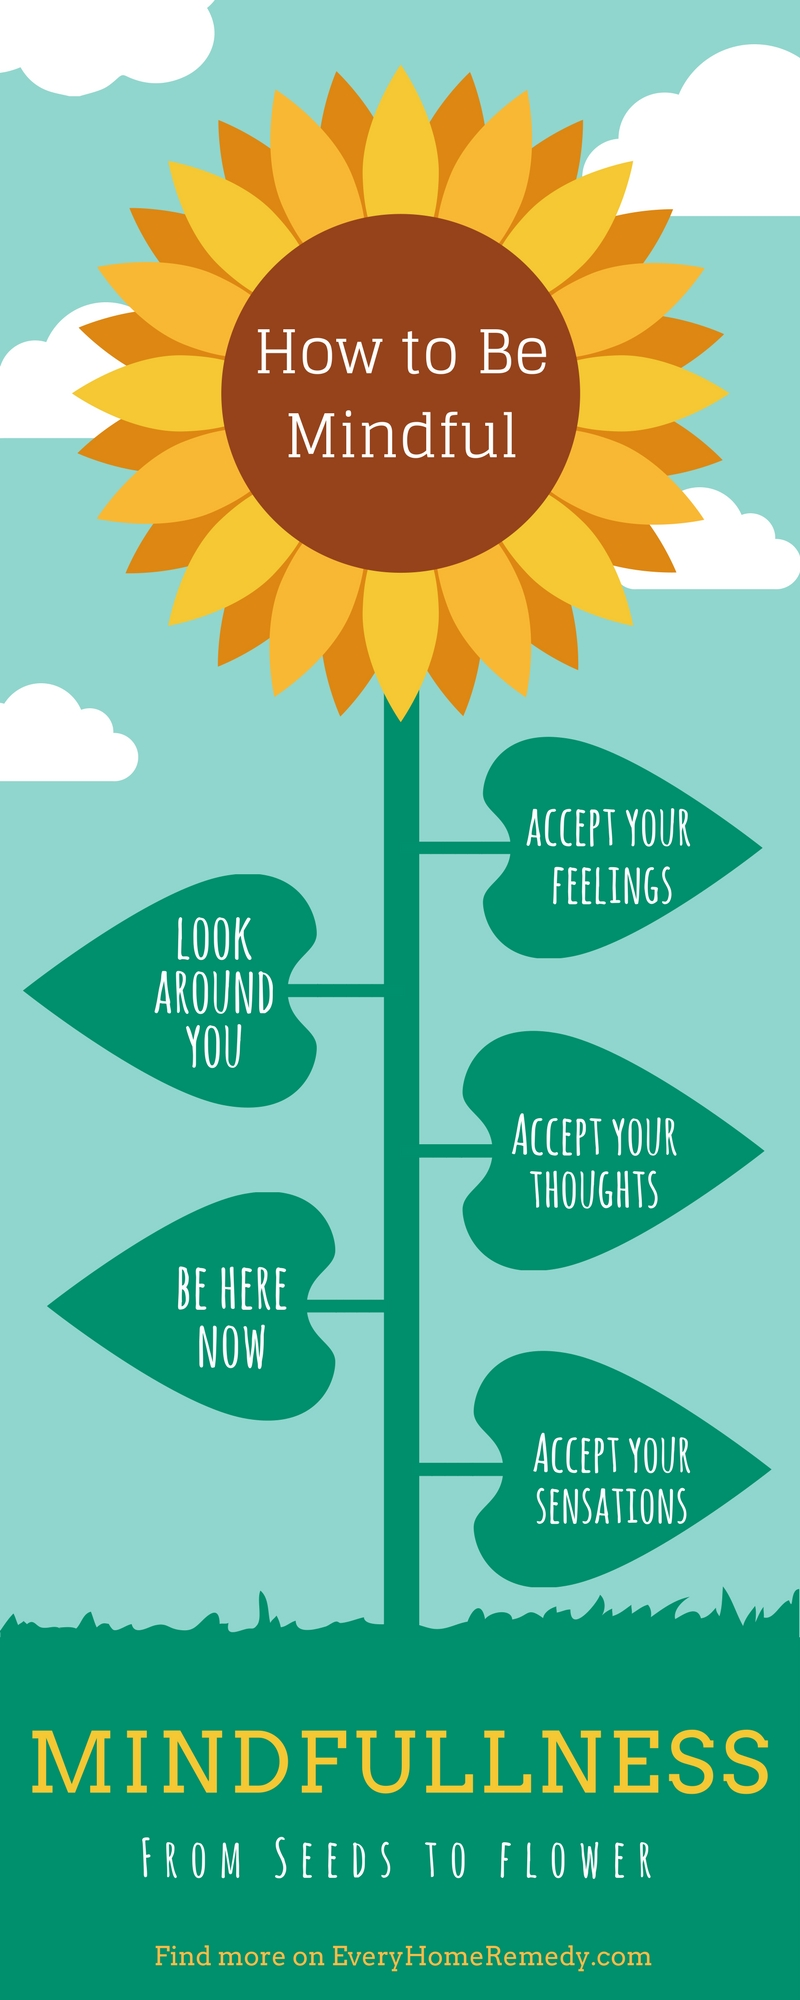 practice mindfullness